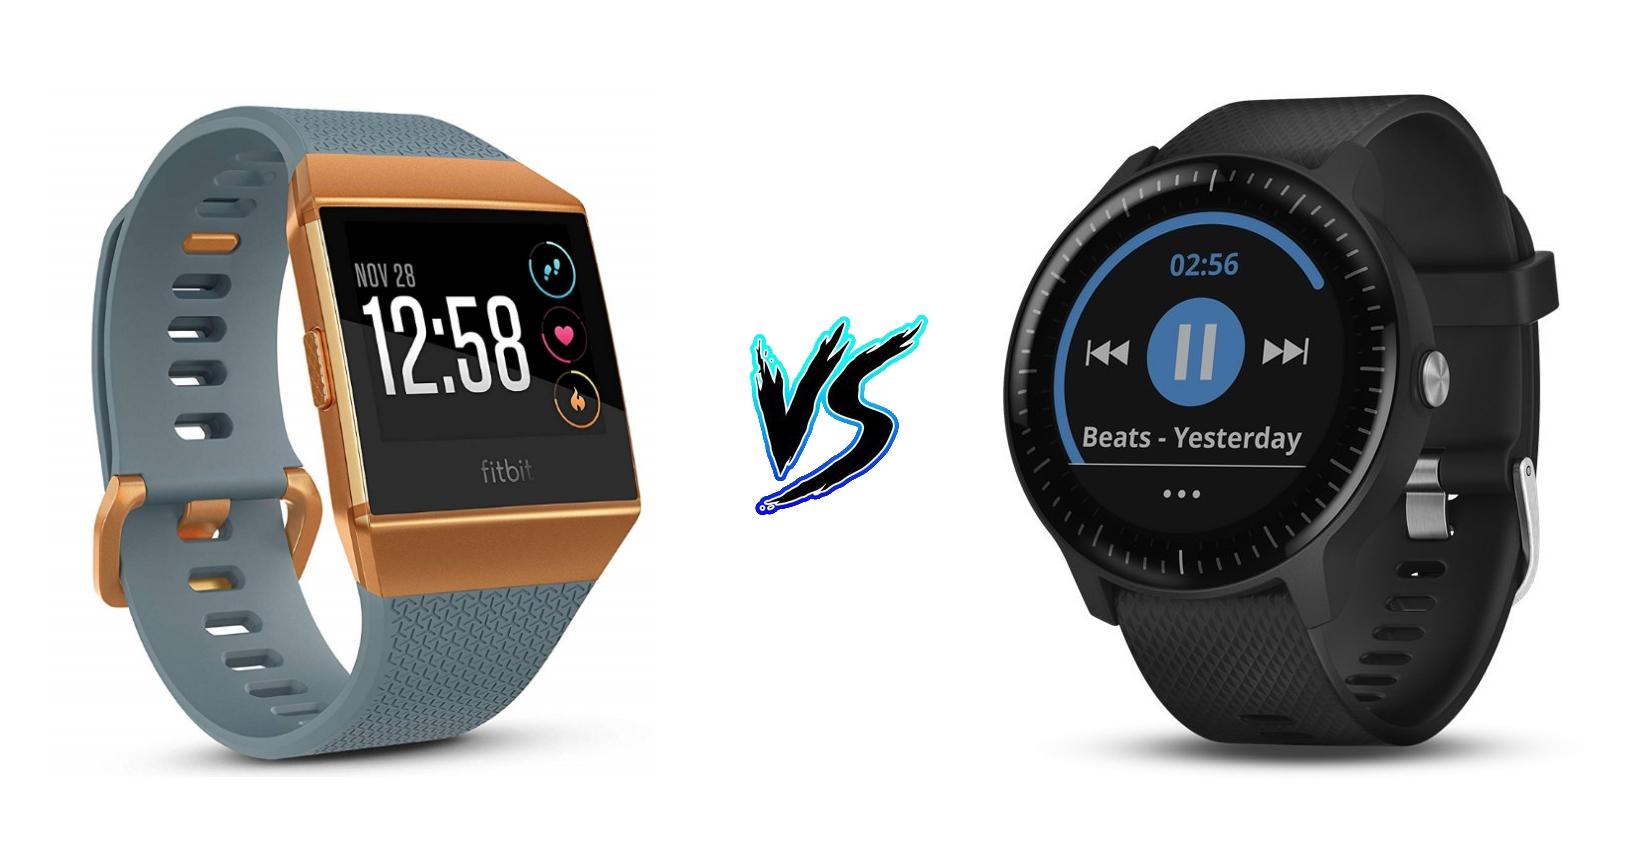 Fitbit Ionic vs Garmin Vivoactive 3 Music